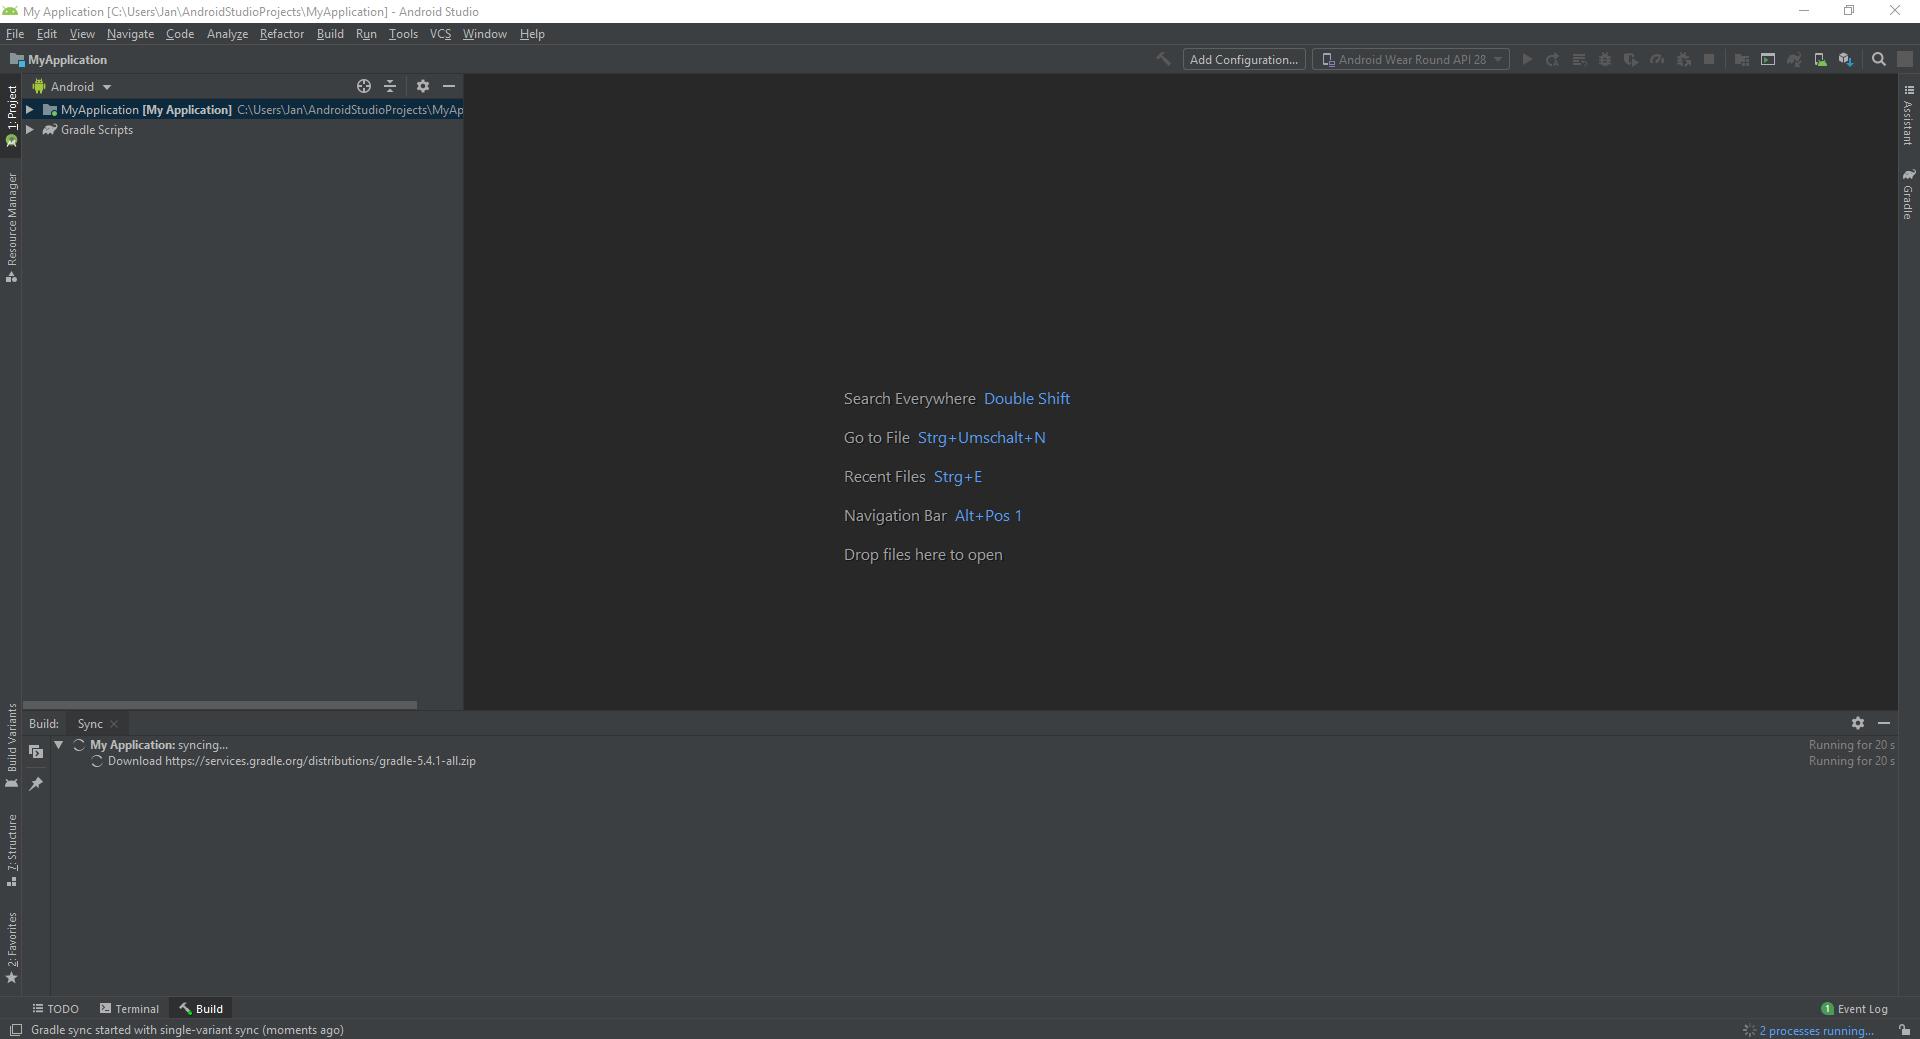 Android Studio installieren